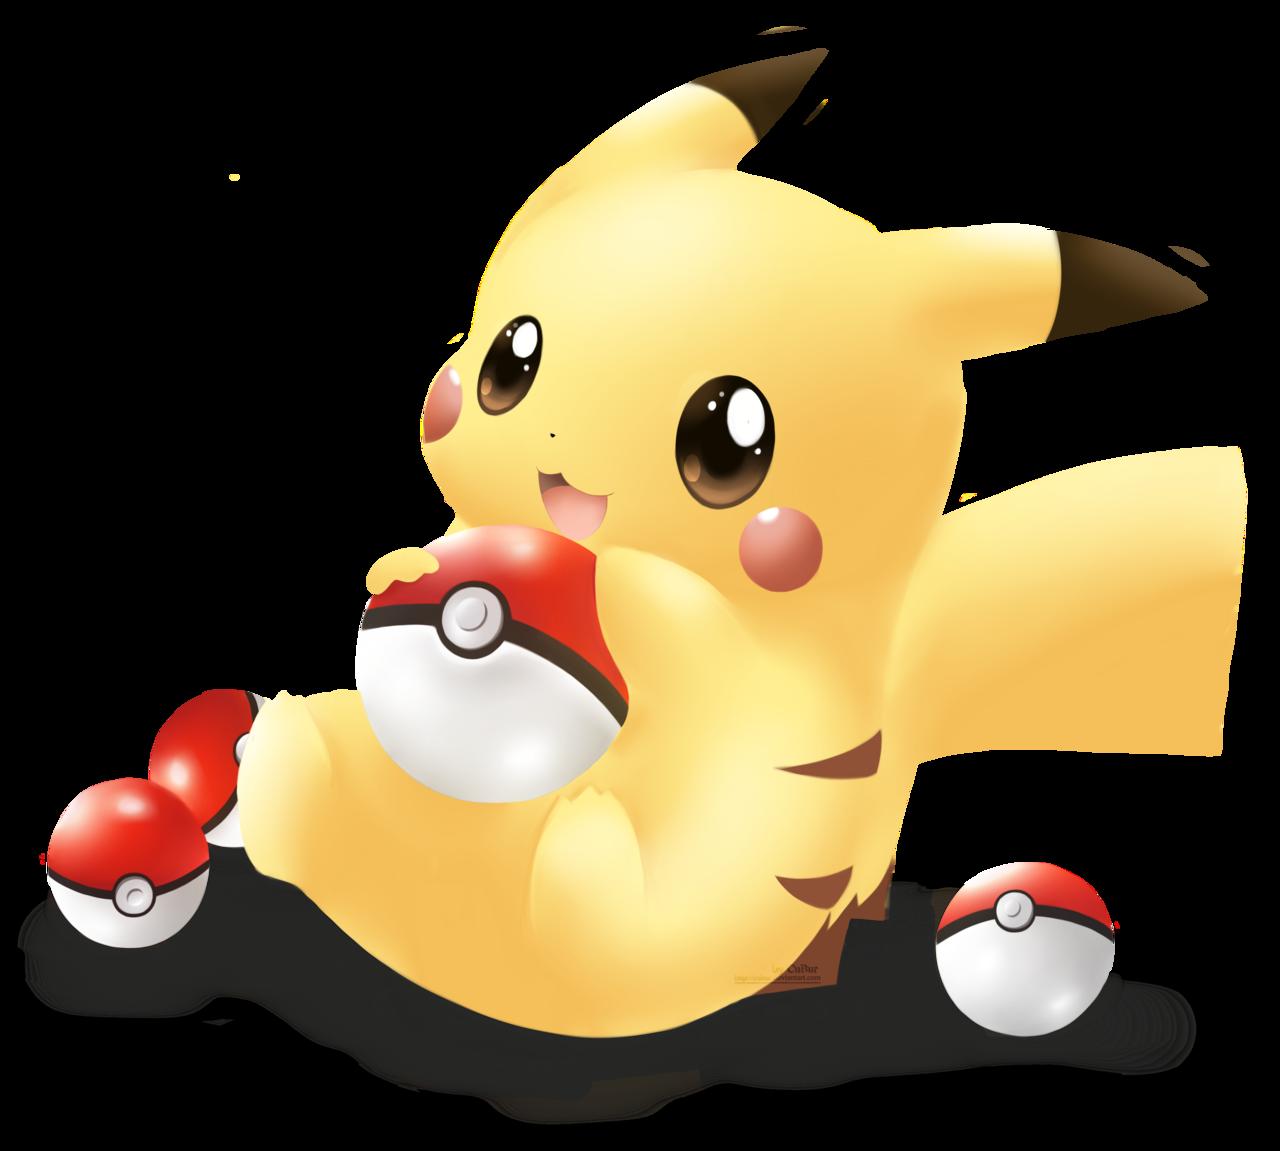 Hd for clip art. Pikachu clipart pokeball wallpaper